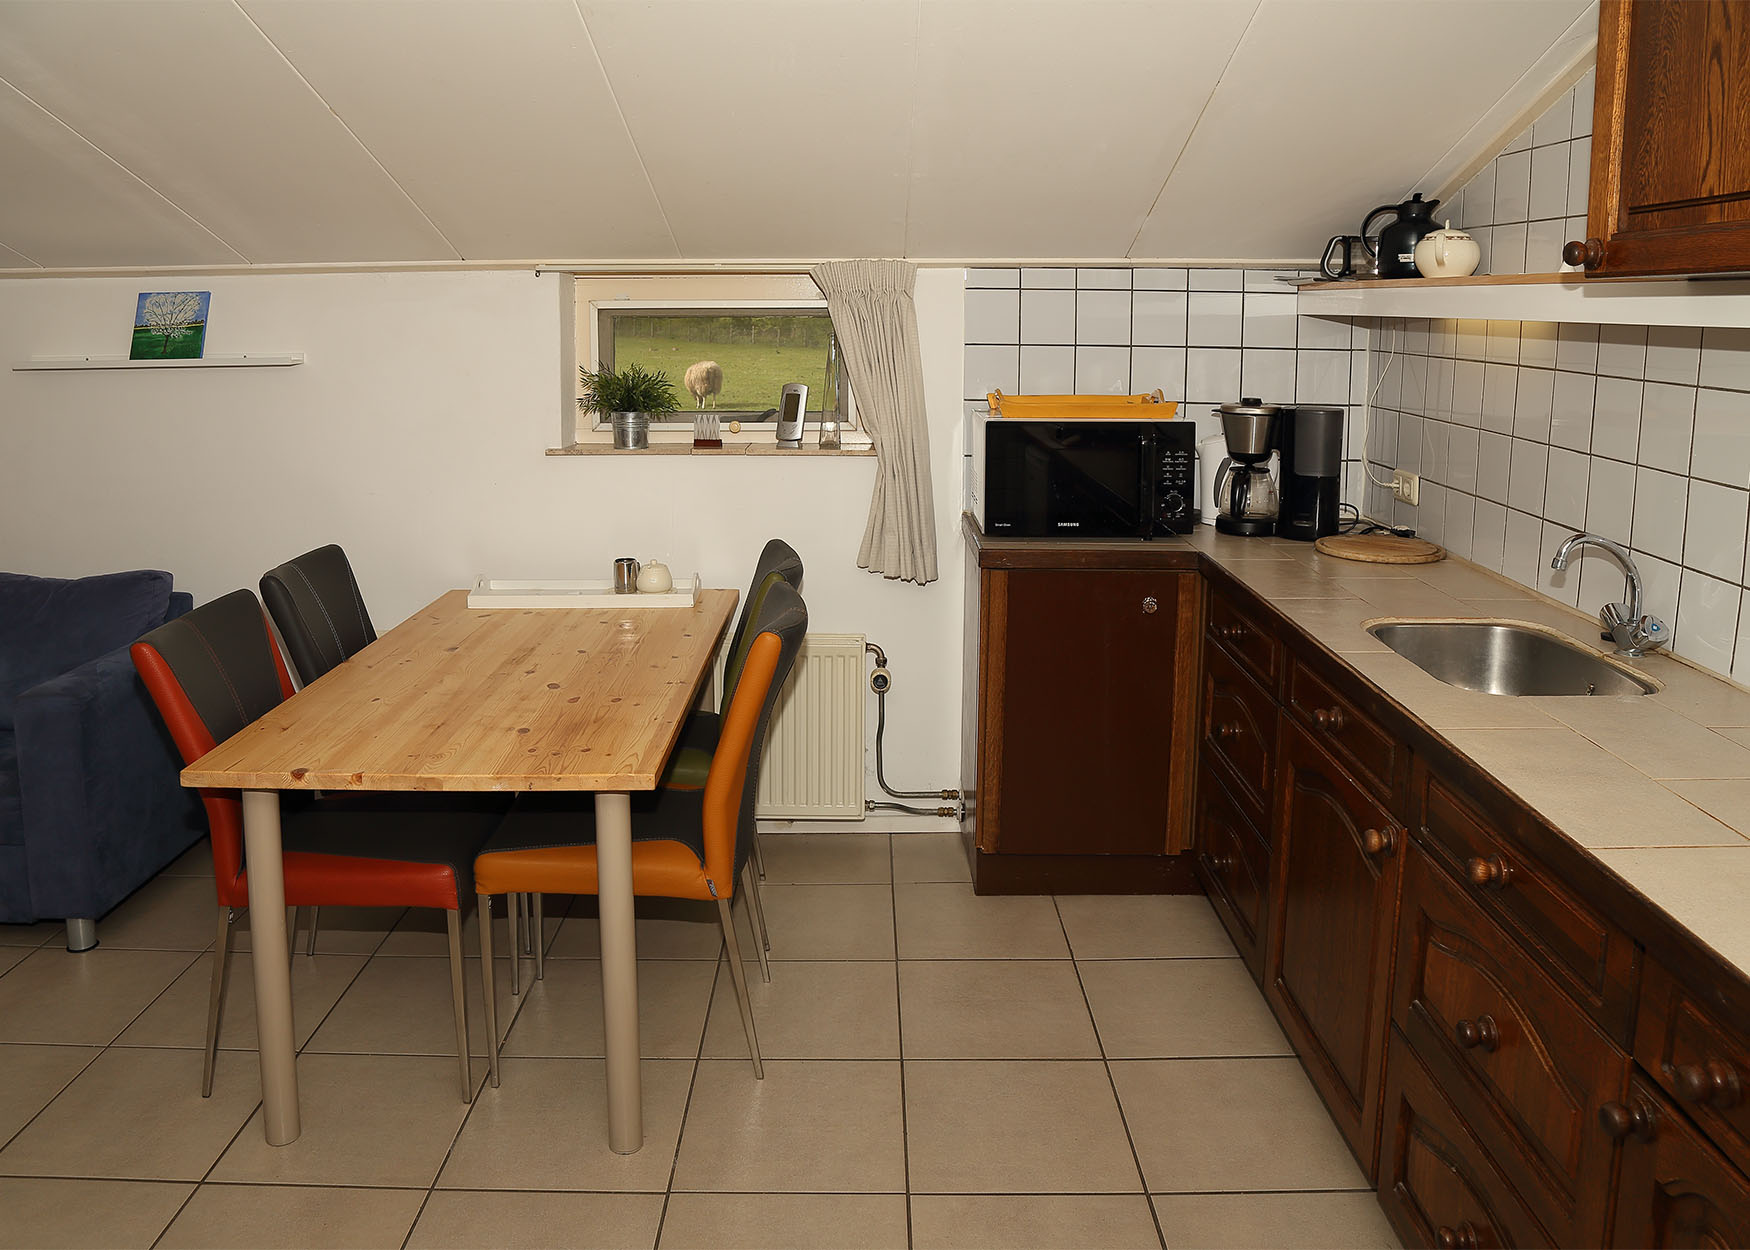 IMG_7708 appartement 1 keukenblok